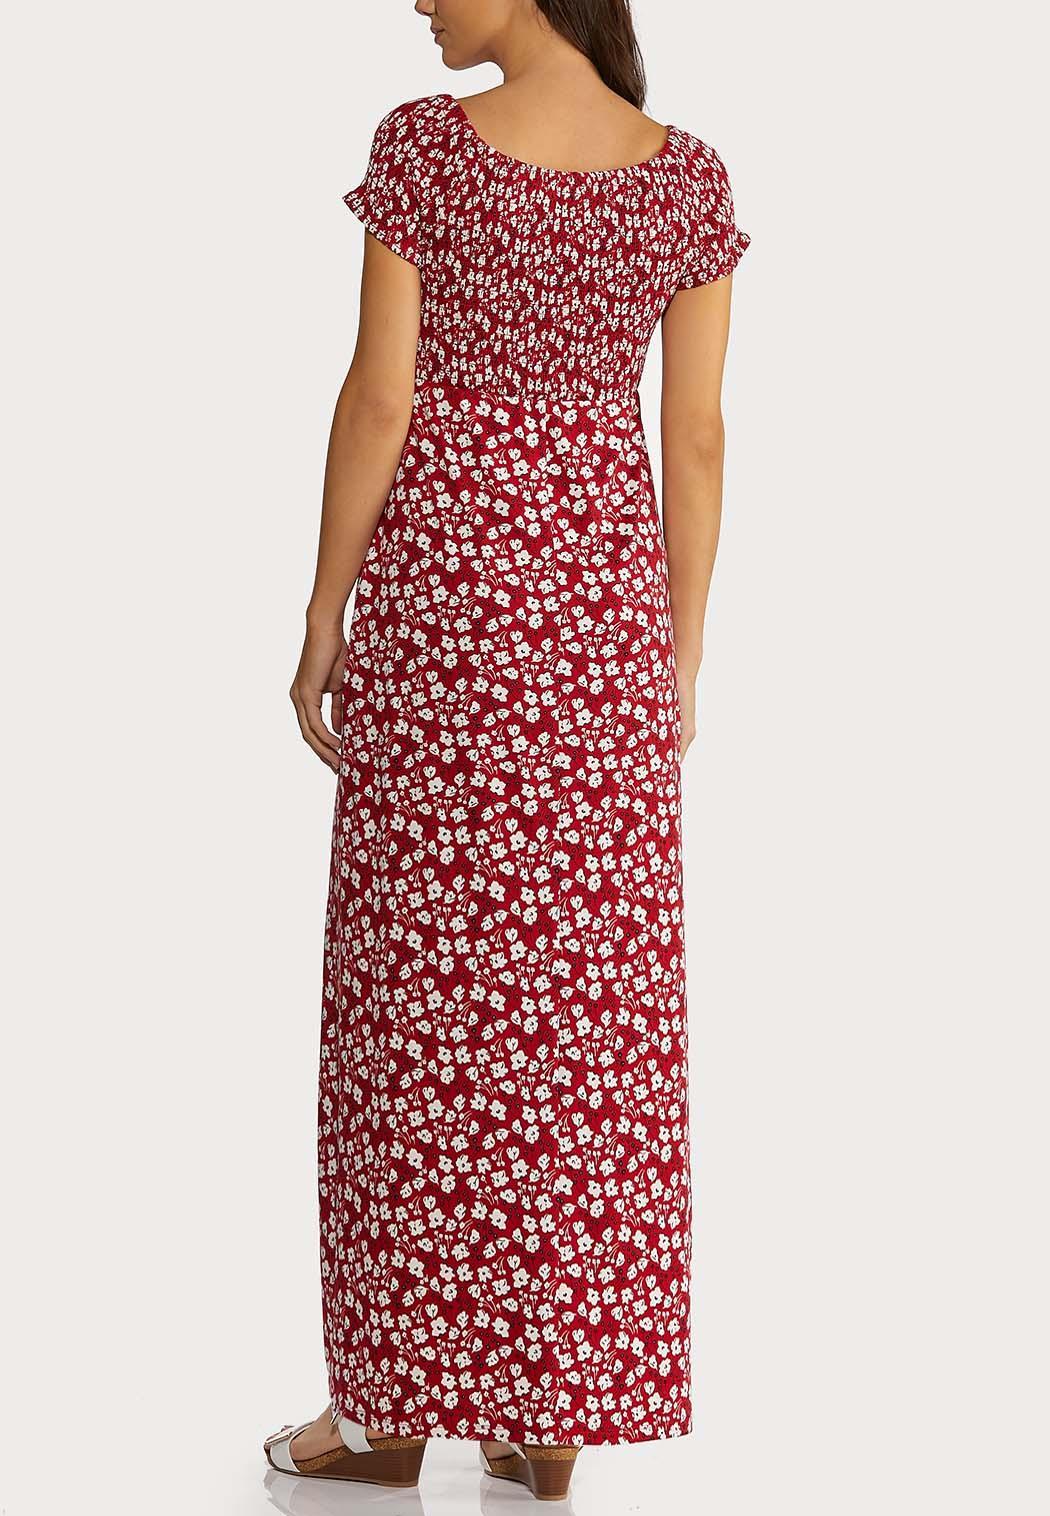 Smocked Floral Maxi Dress (Item #44176588)